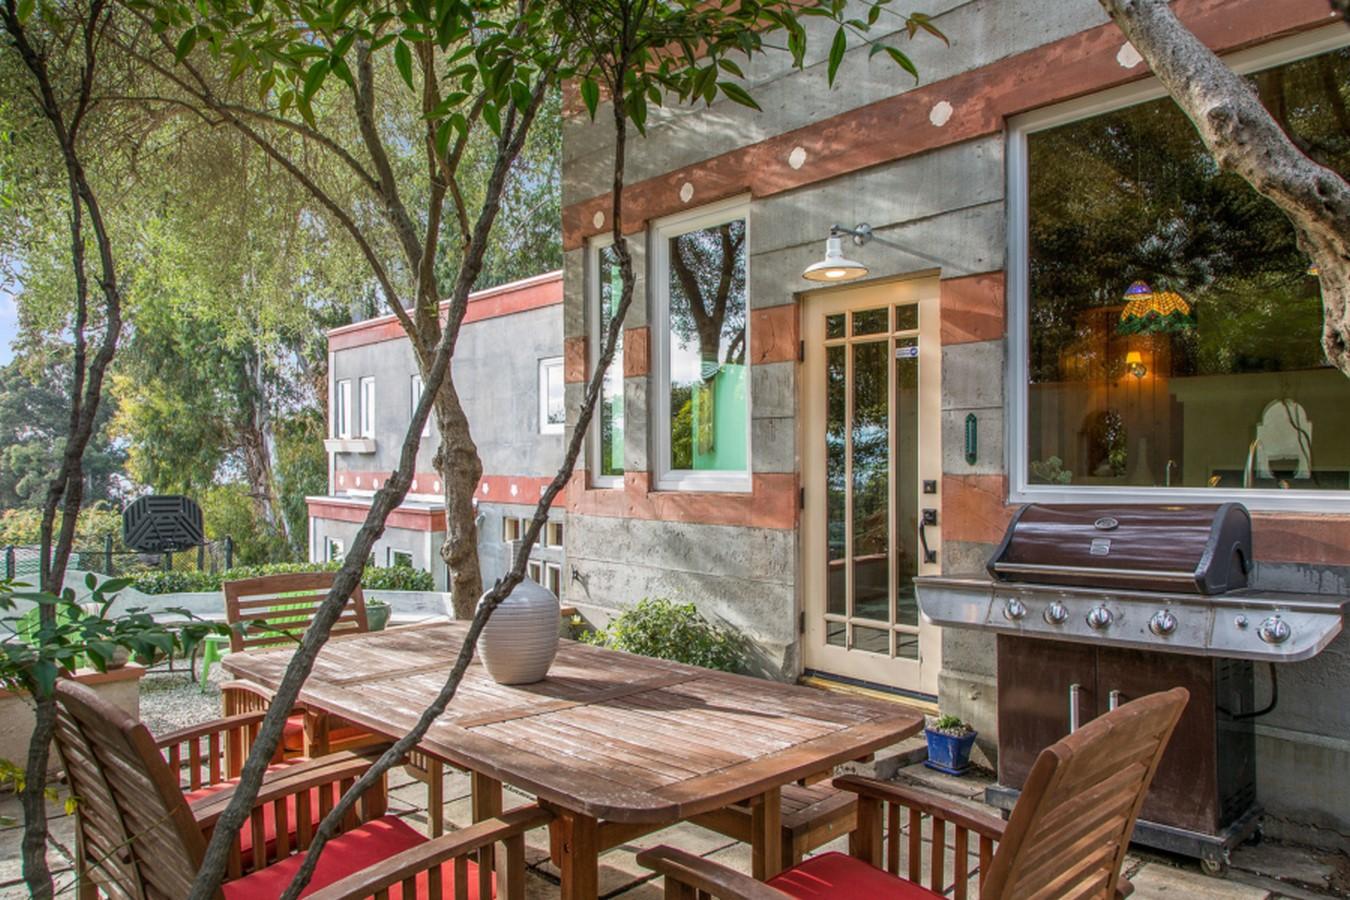 Christopher Alexander -The Sala House, Hillside Avenue, California. - Sheet3